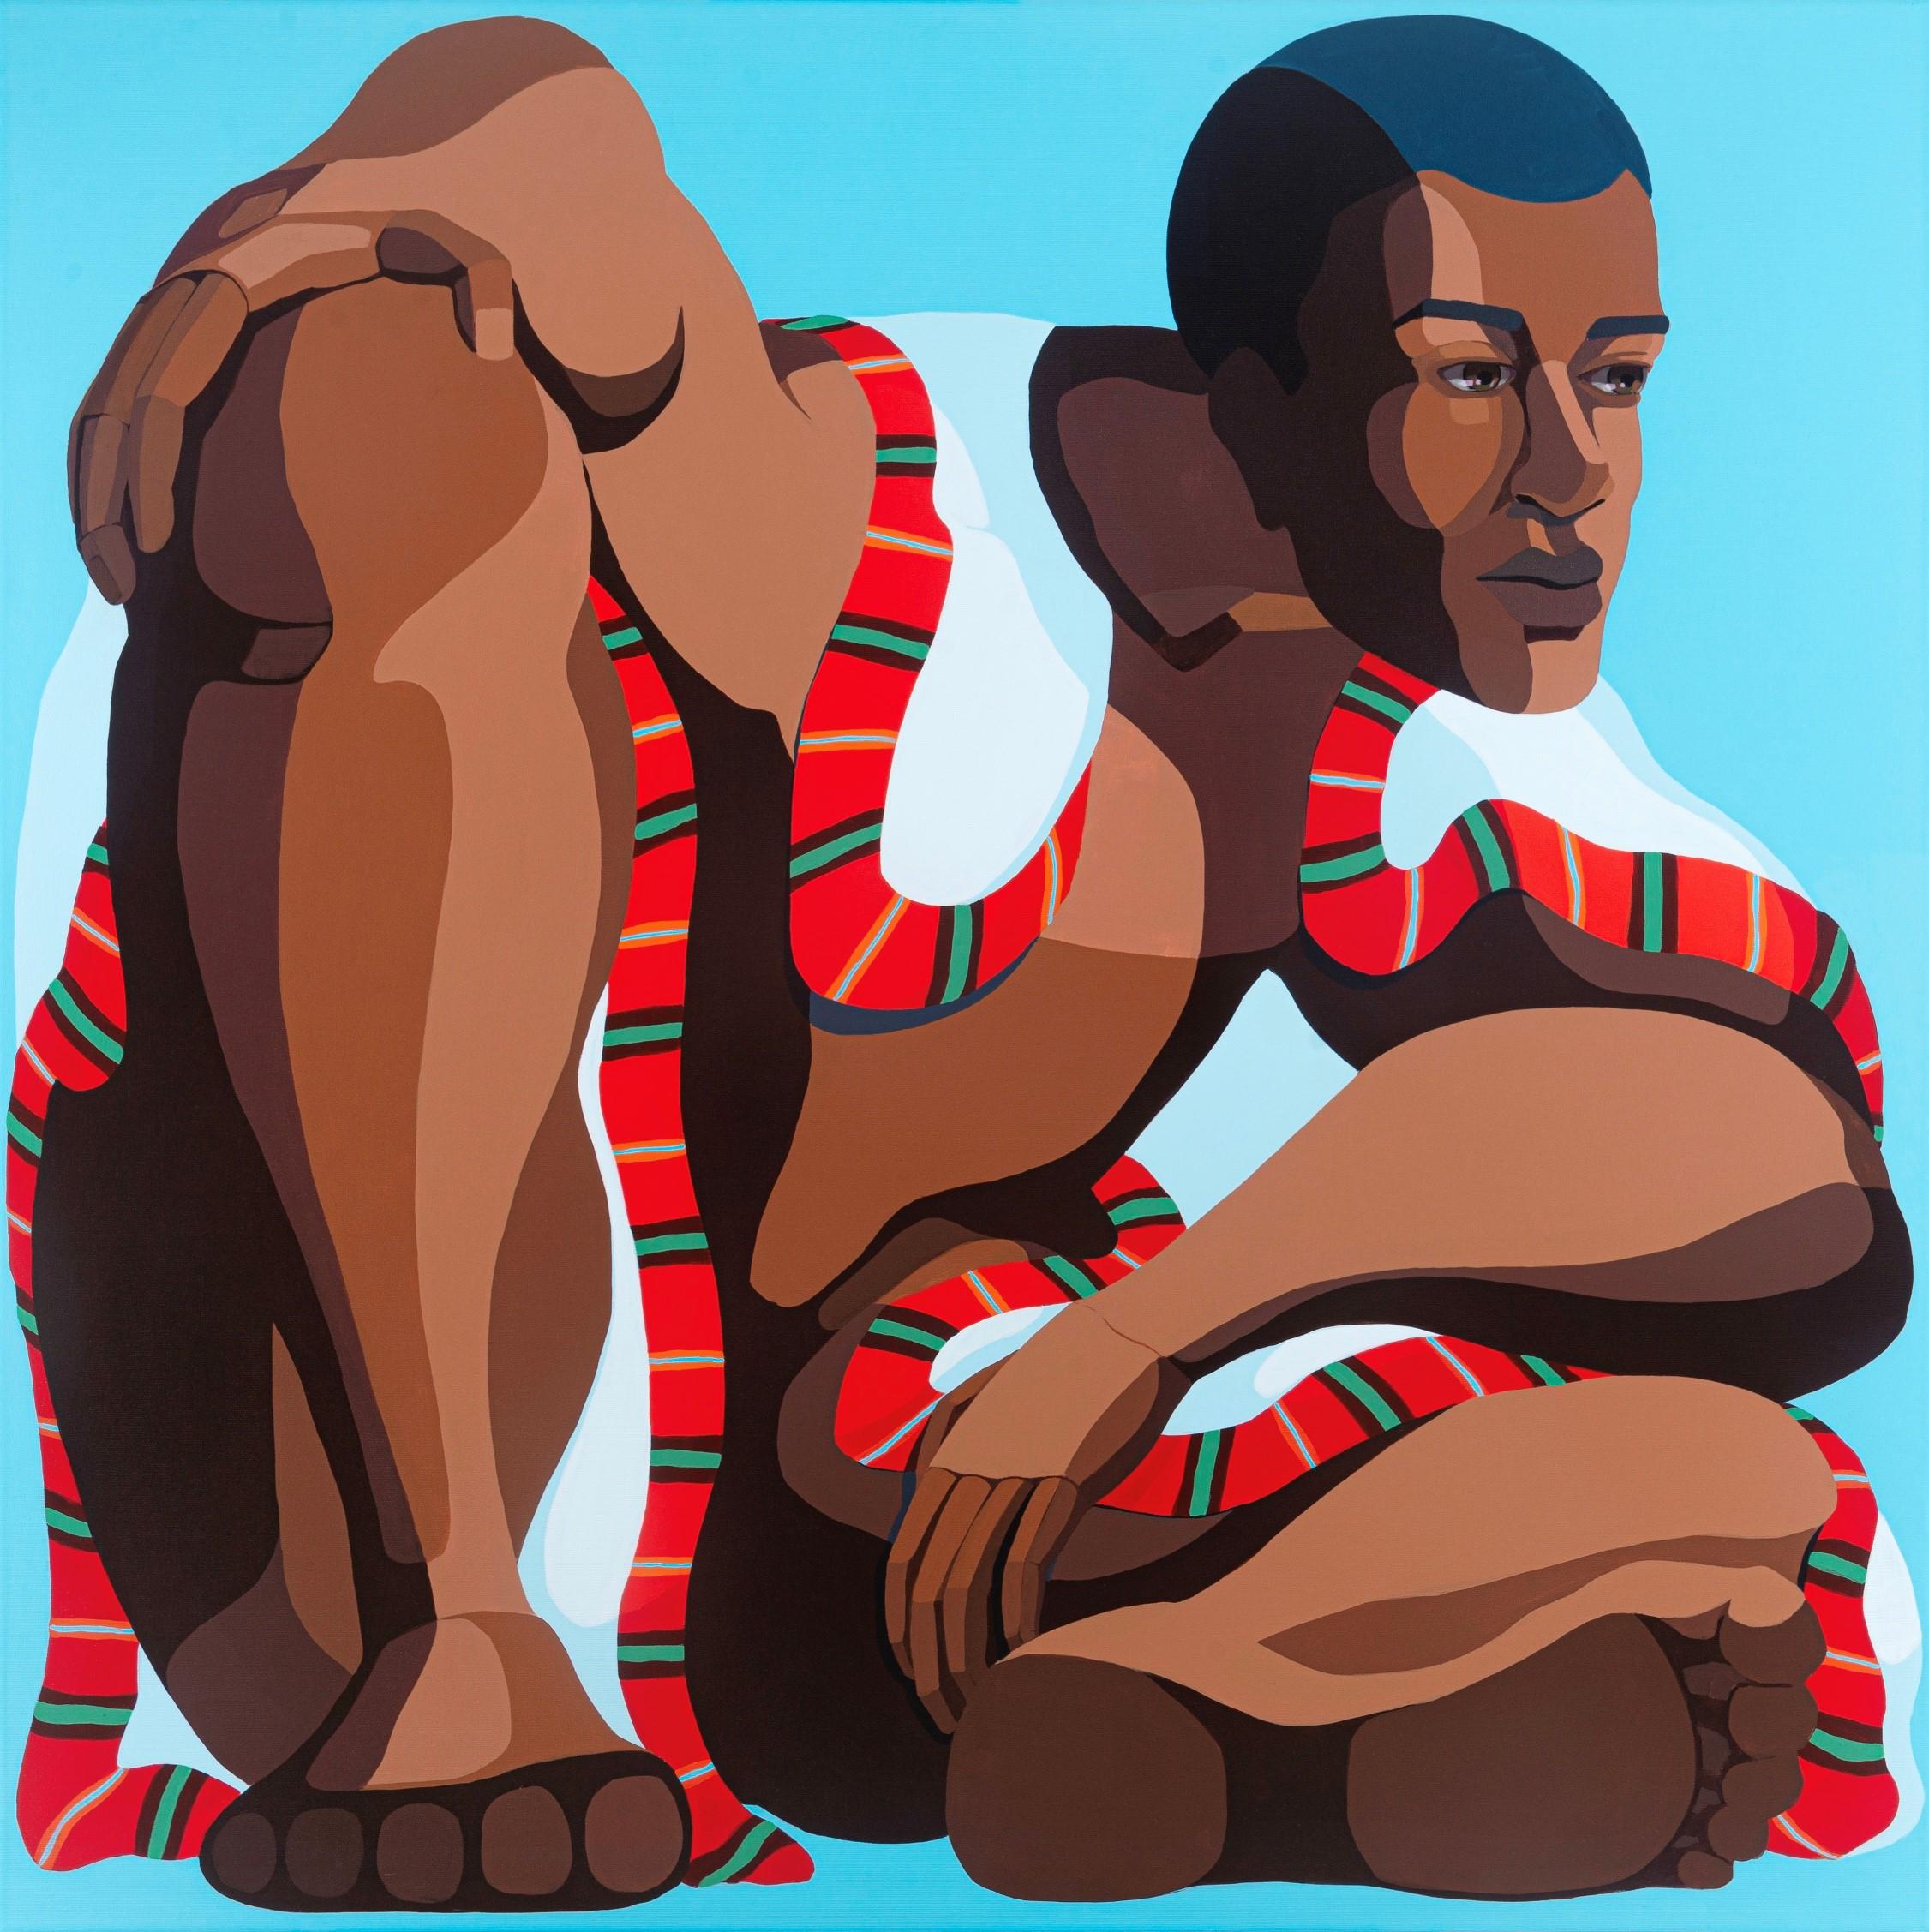 Nirit Takele, Big Man, 100x100 cm, acrylic on canvas, 2020